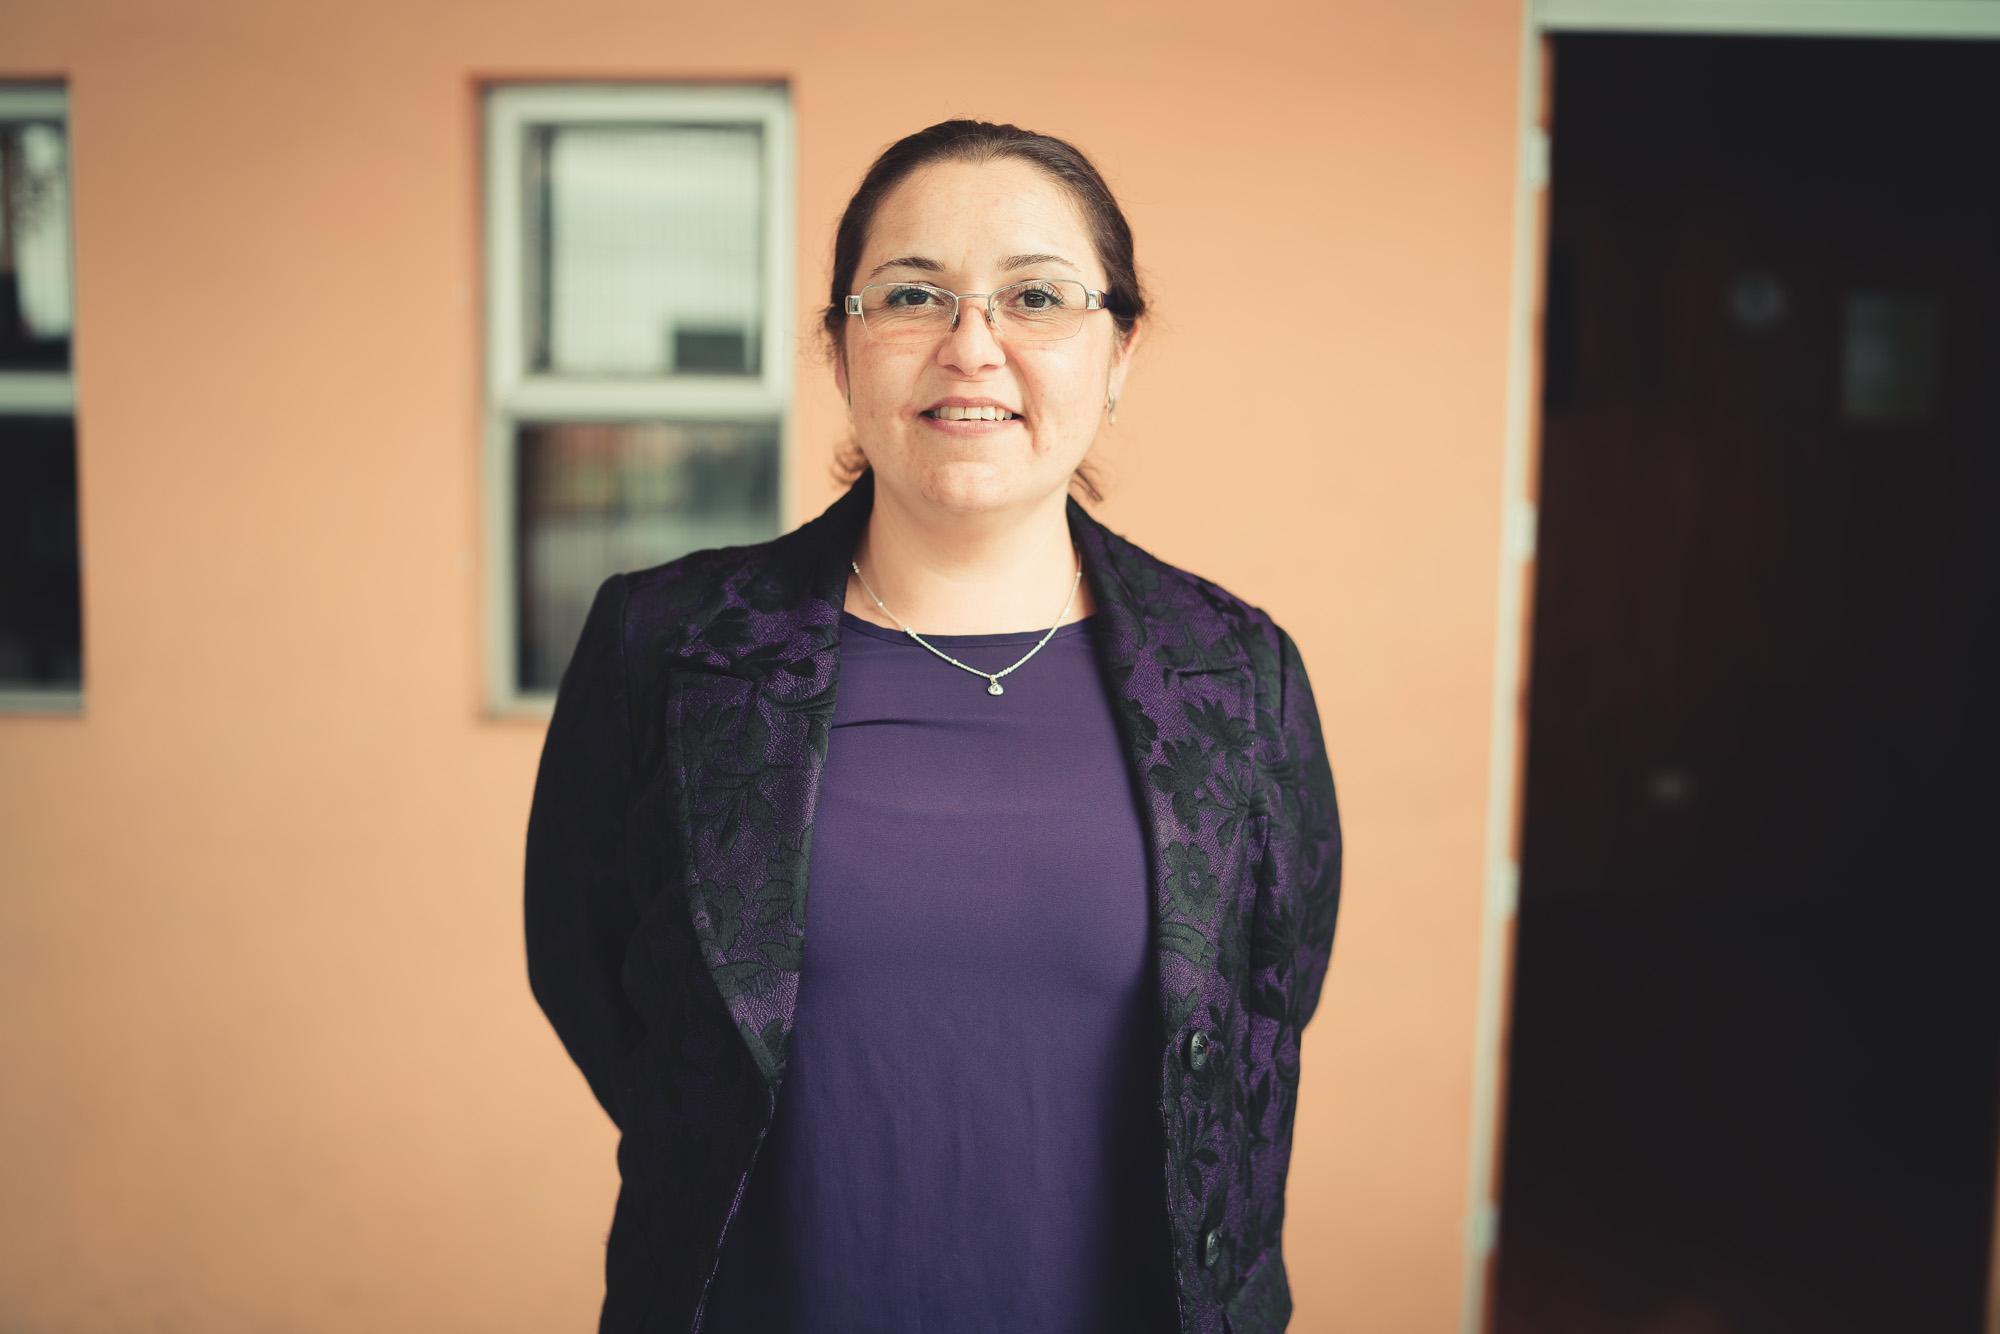 Sra. Claudia Toledo Arqueros - Orientadora